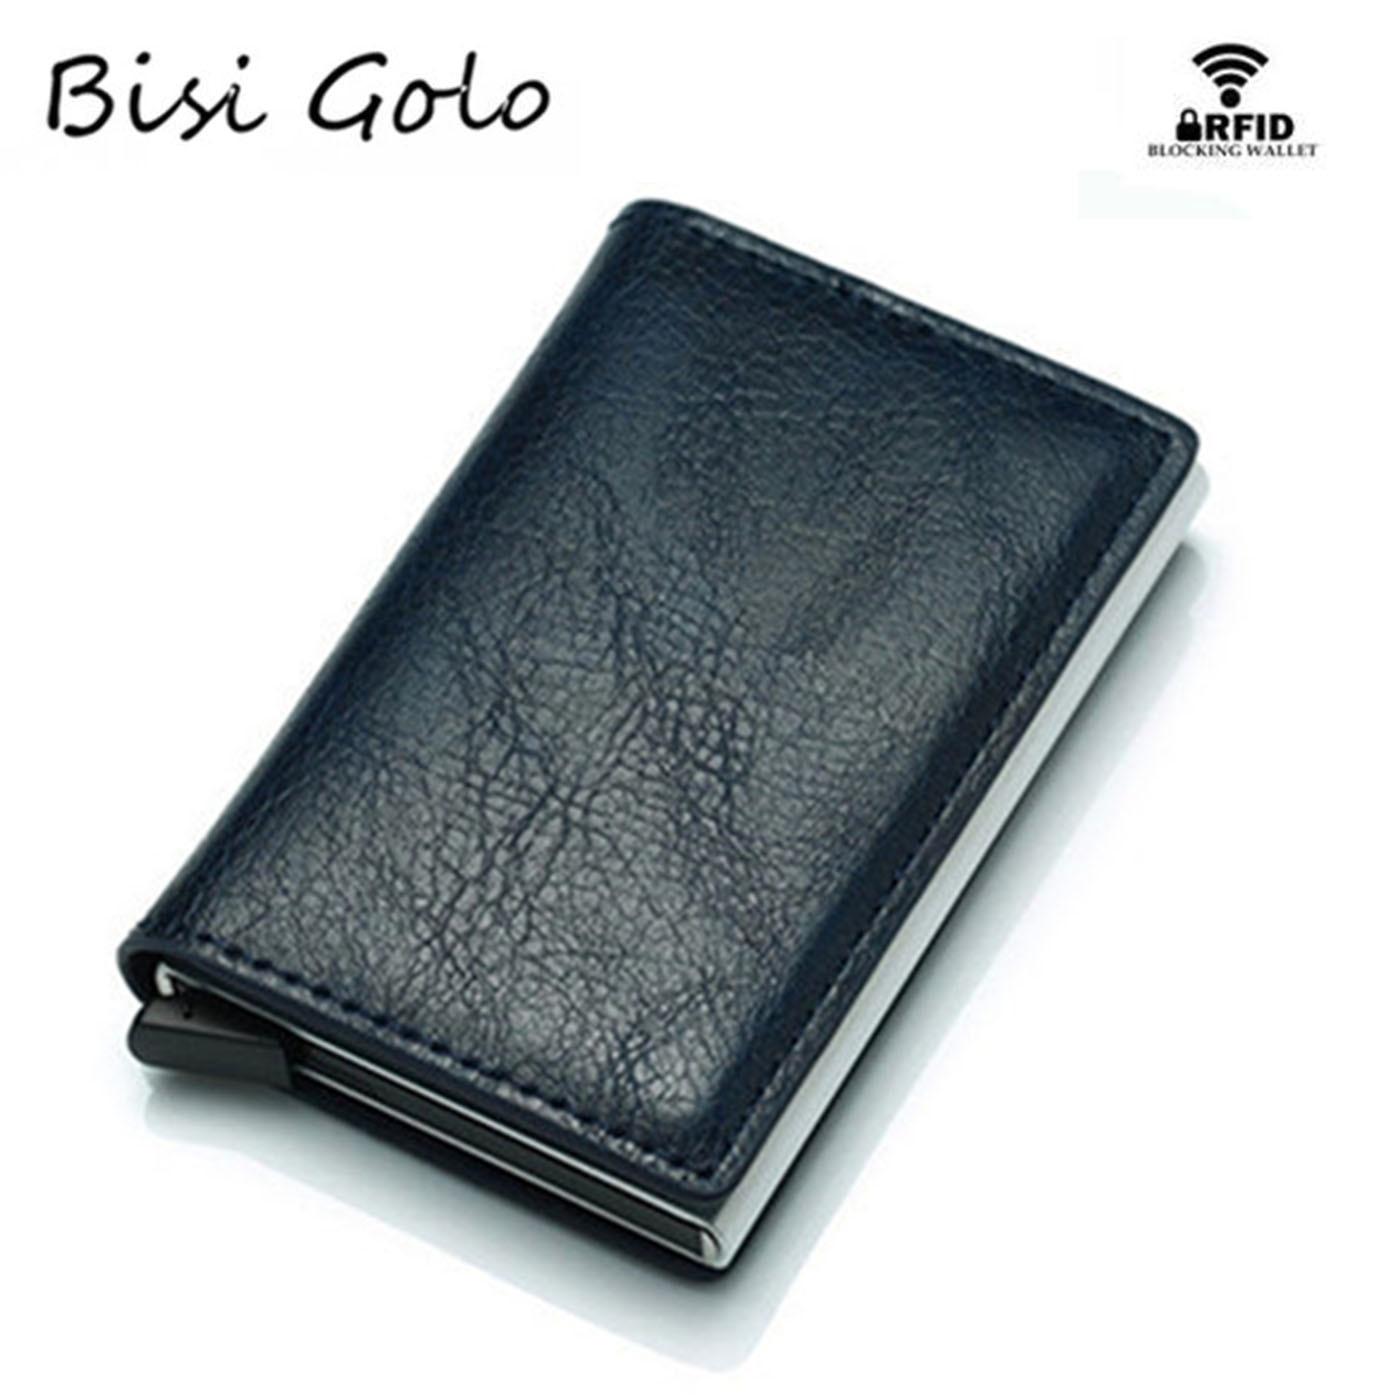 BISI GORO Men Wallet Blocking Rfid PU Leather Vintage 2020 Credit Card Holder Unisex Antitheft Security Aluminum Metal Purse